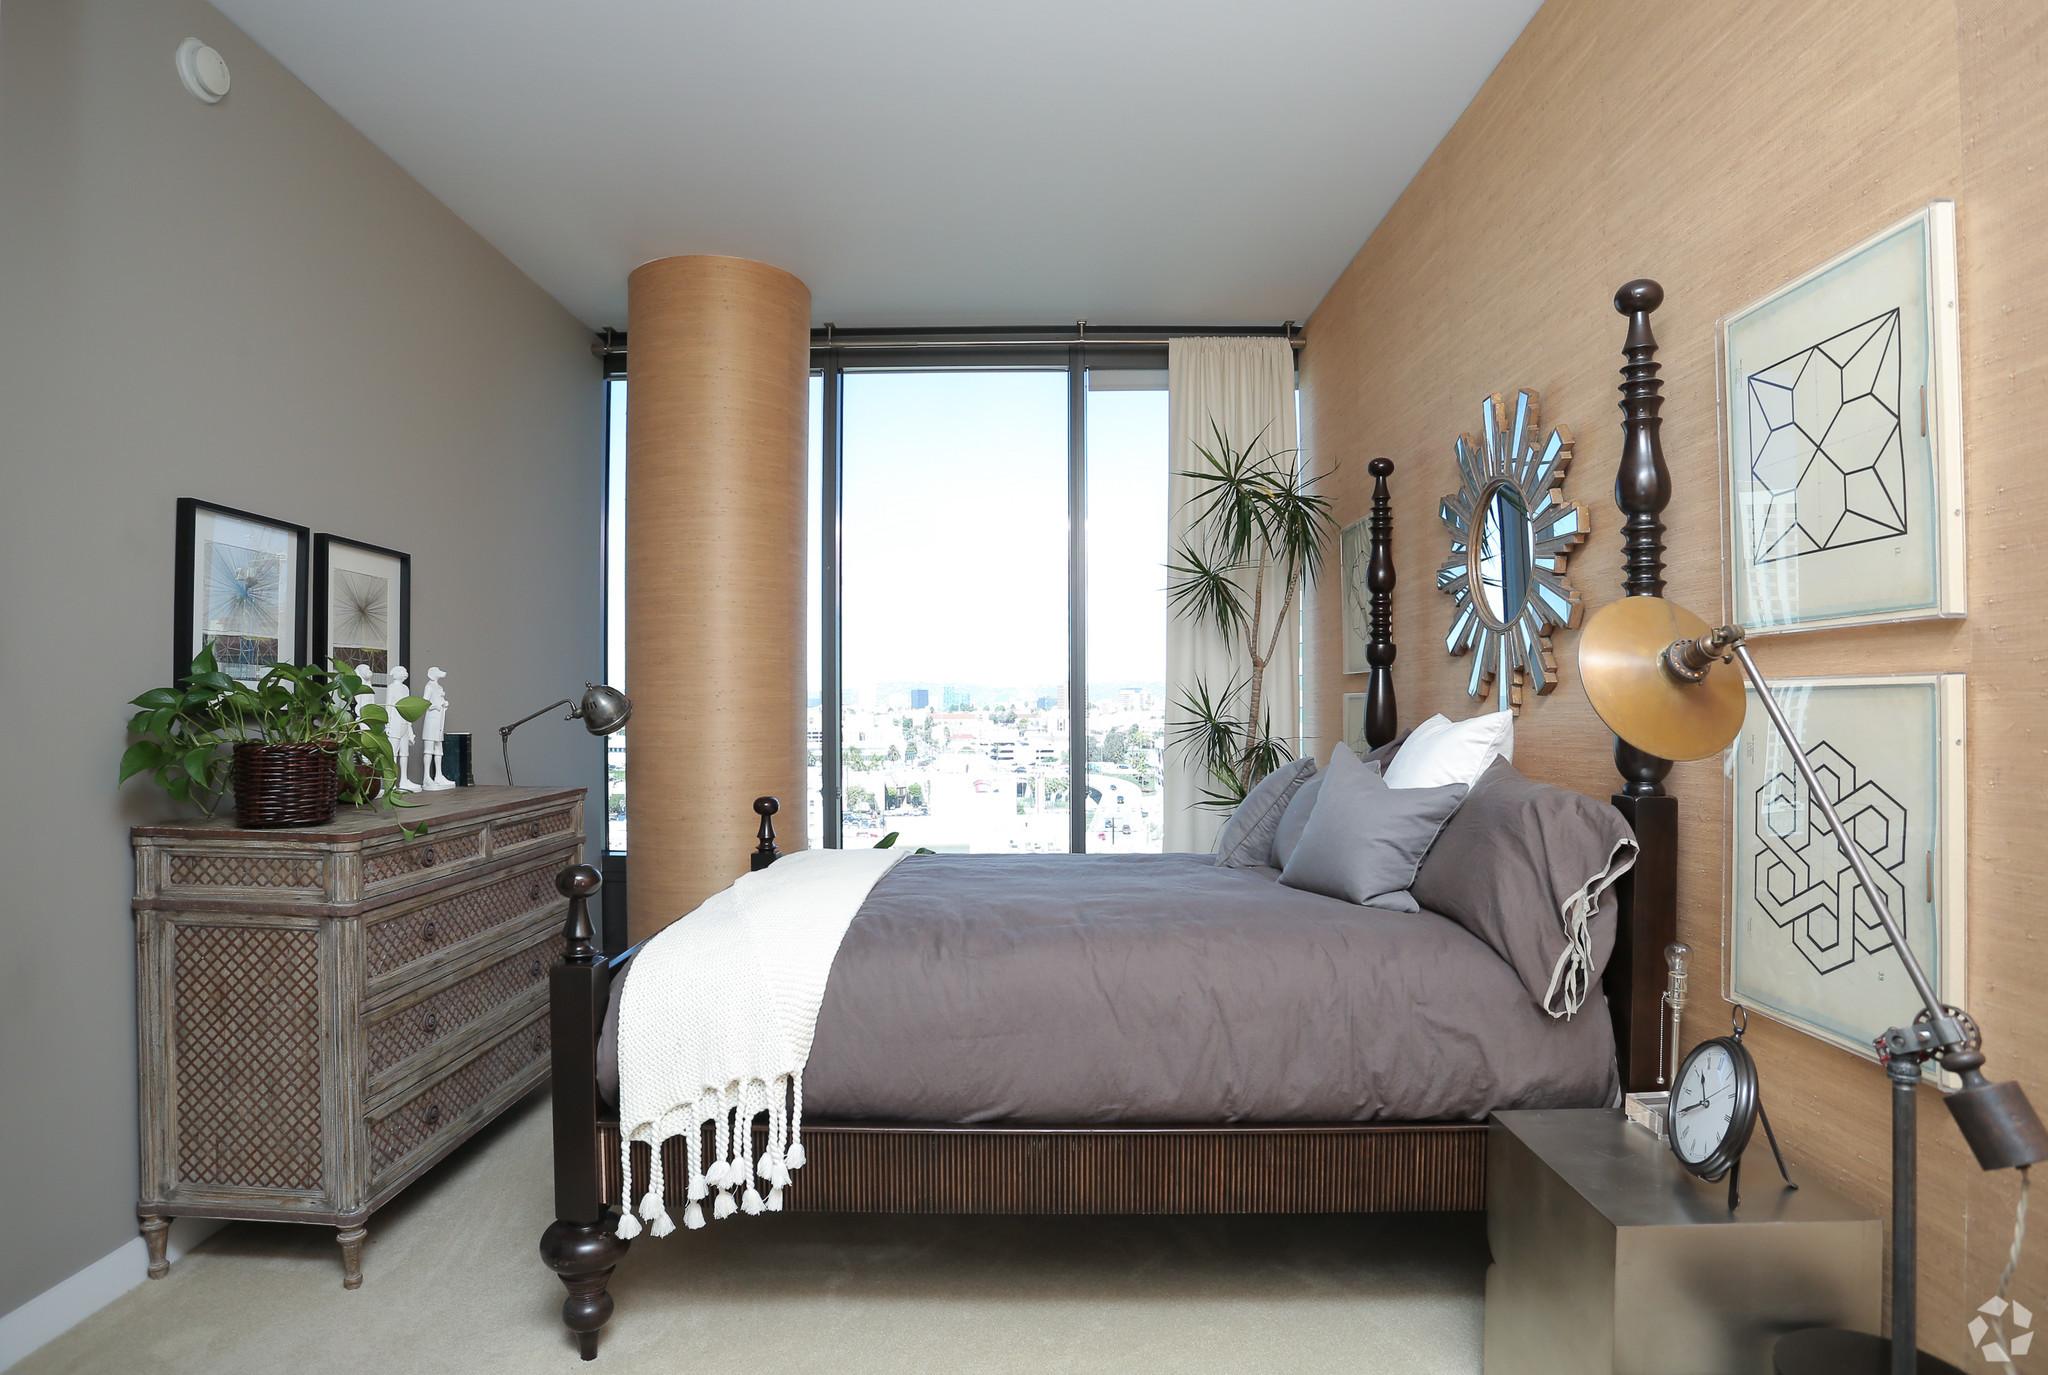 APEX. The One. Apartments Los Angeles, CA Apartment